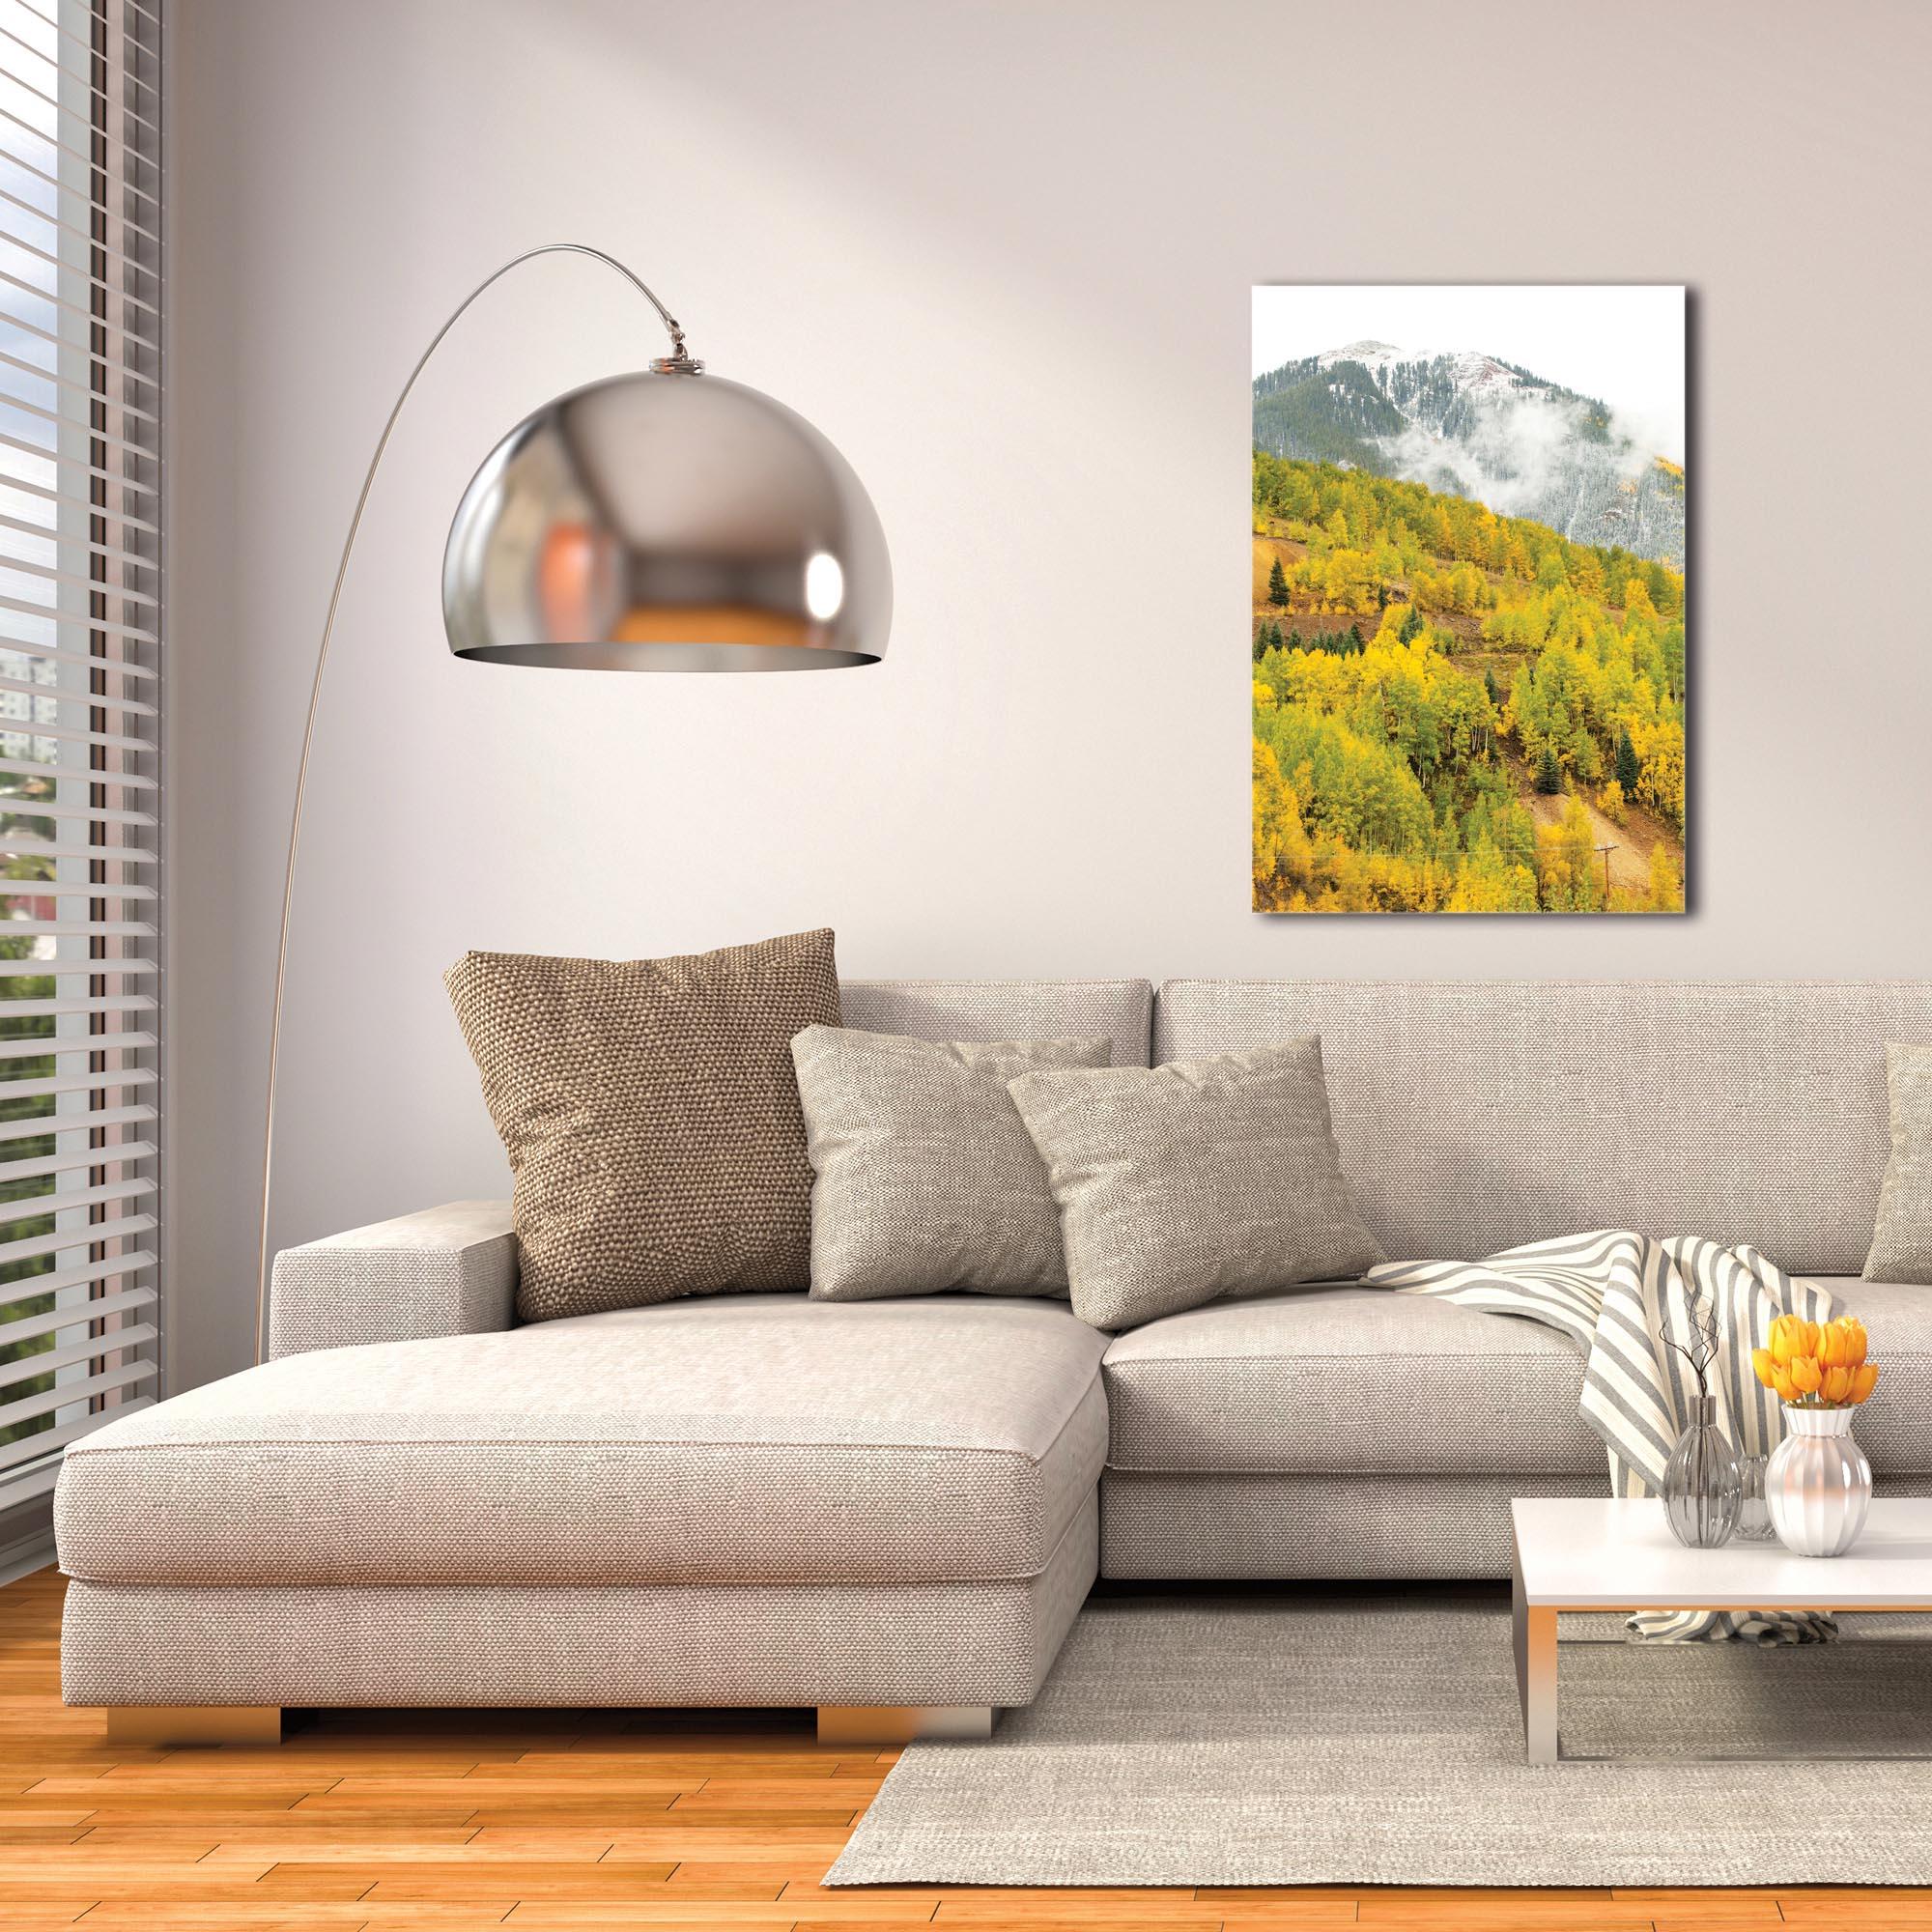 Landscape Photography 'Changing Season' - Autumn Nature Art on Metal or Plexiglass - Image 3